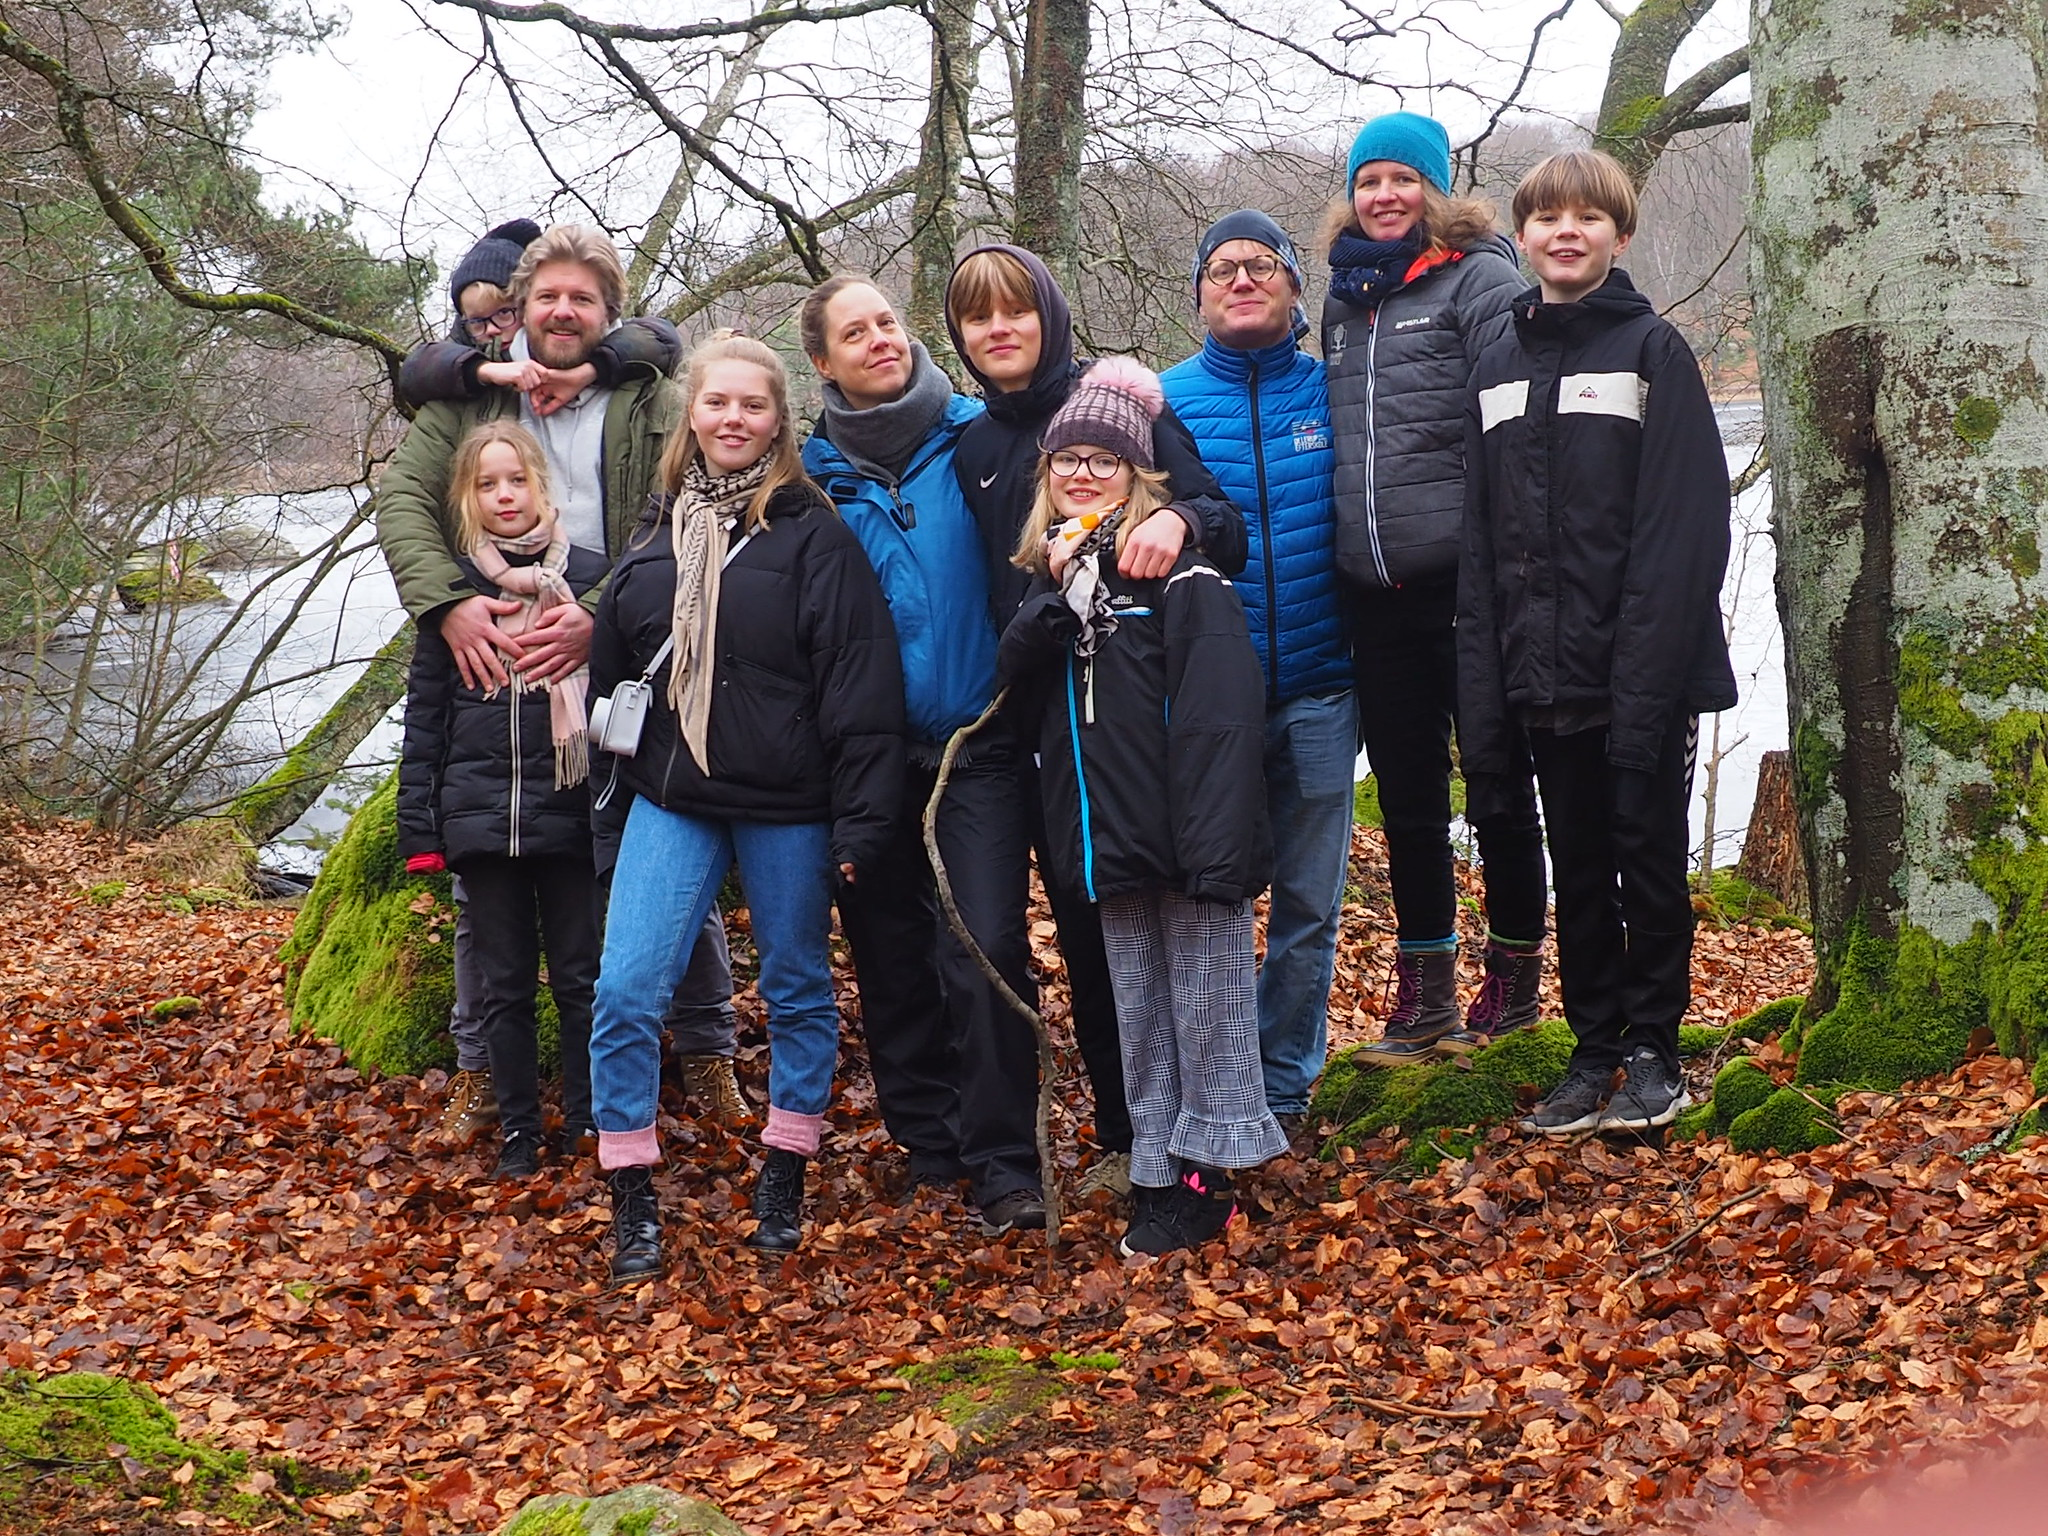 Vinterferie i Sverige